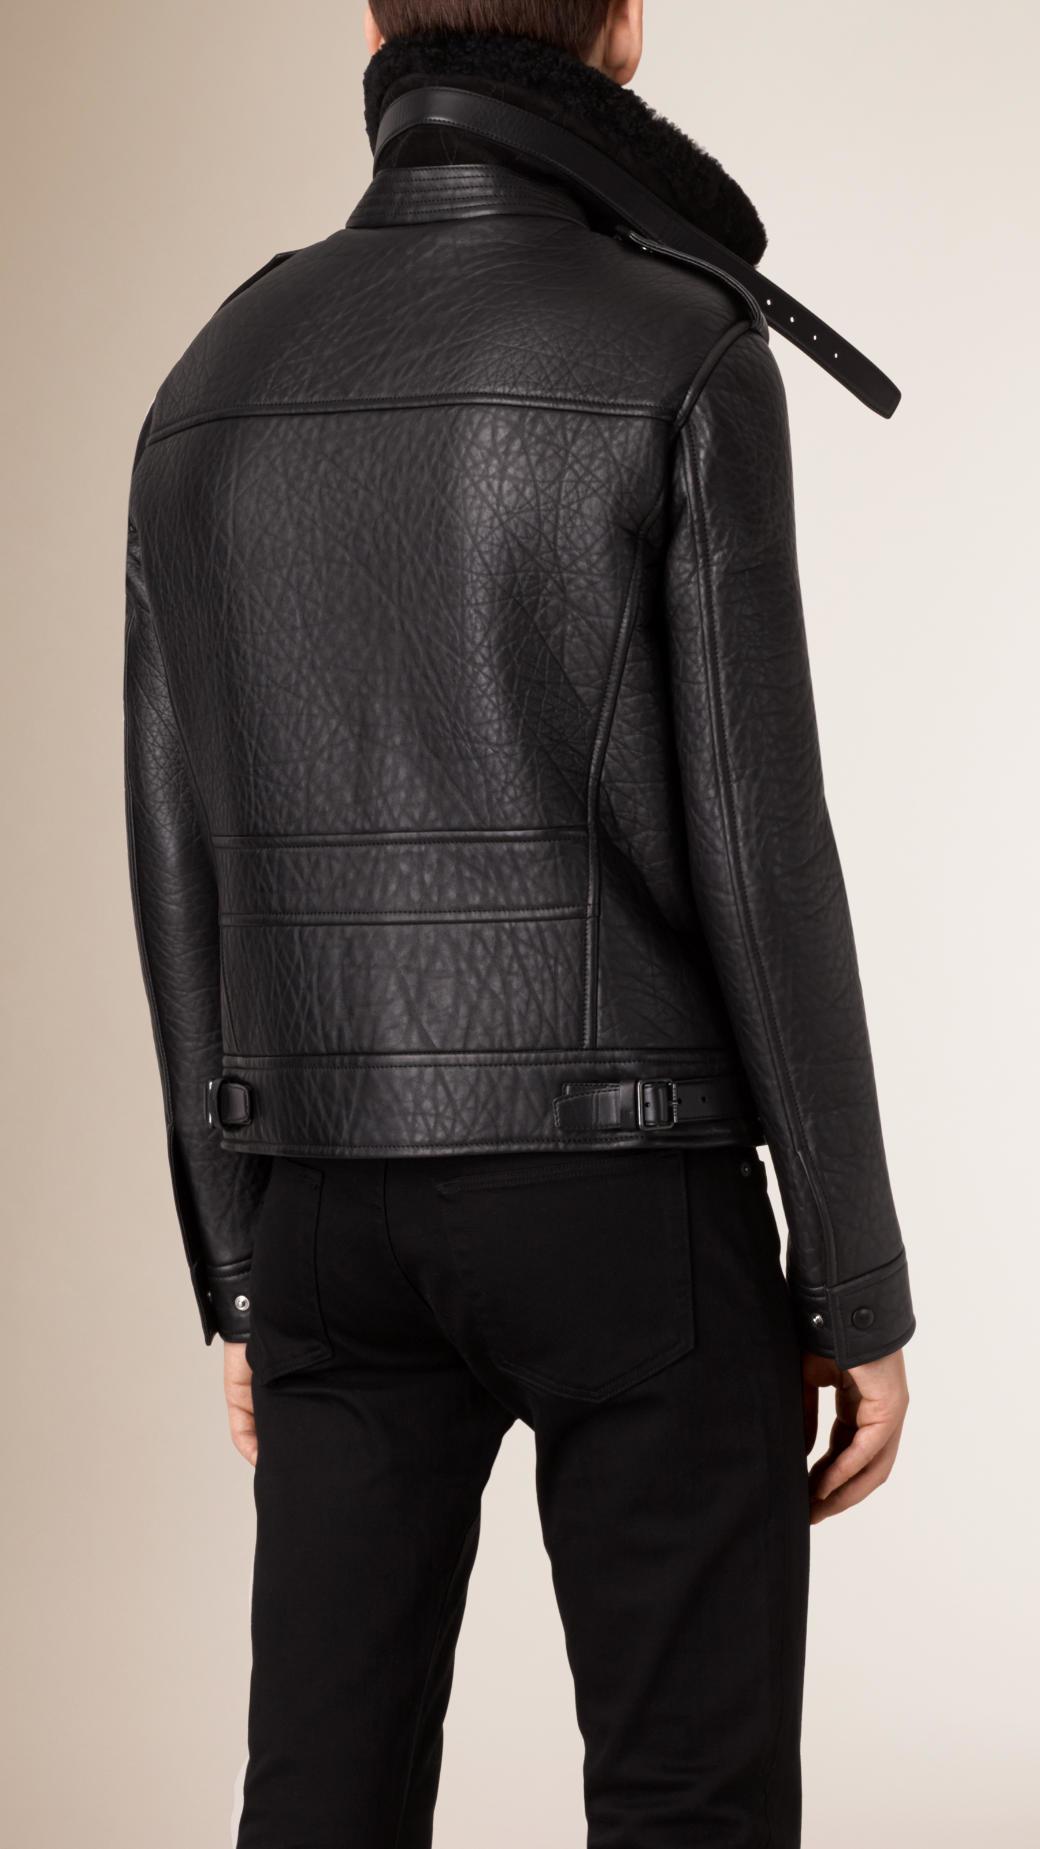 Burberry Leather Shearling Trim Lambskin Aviator Jacket in Black for Men